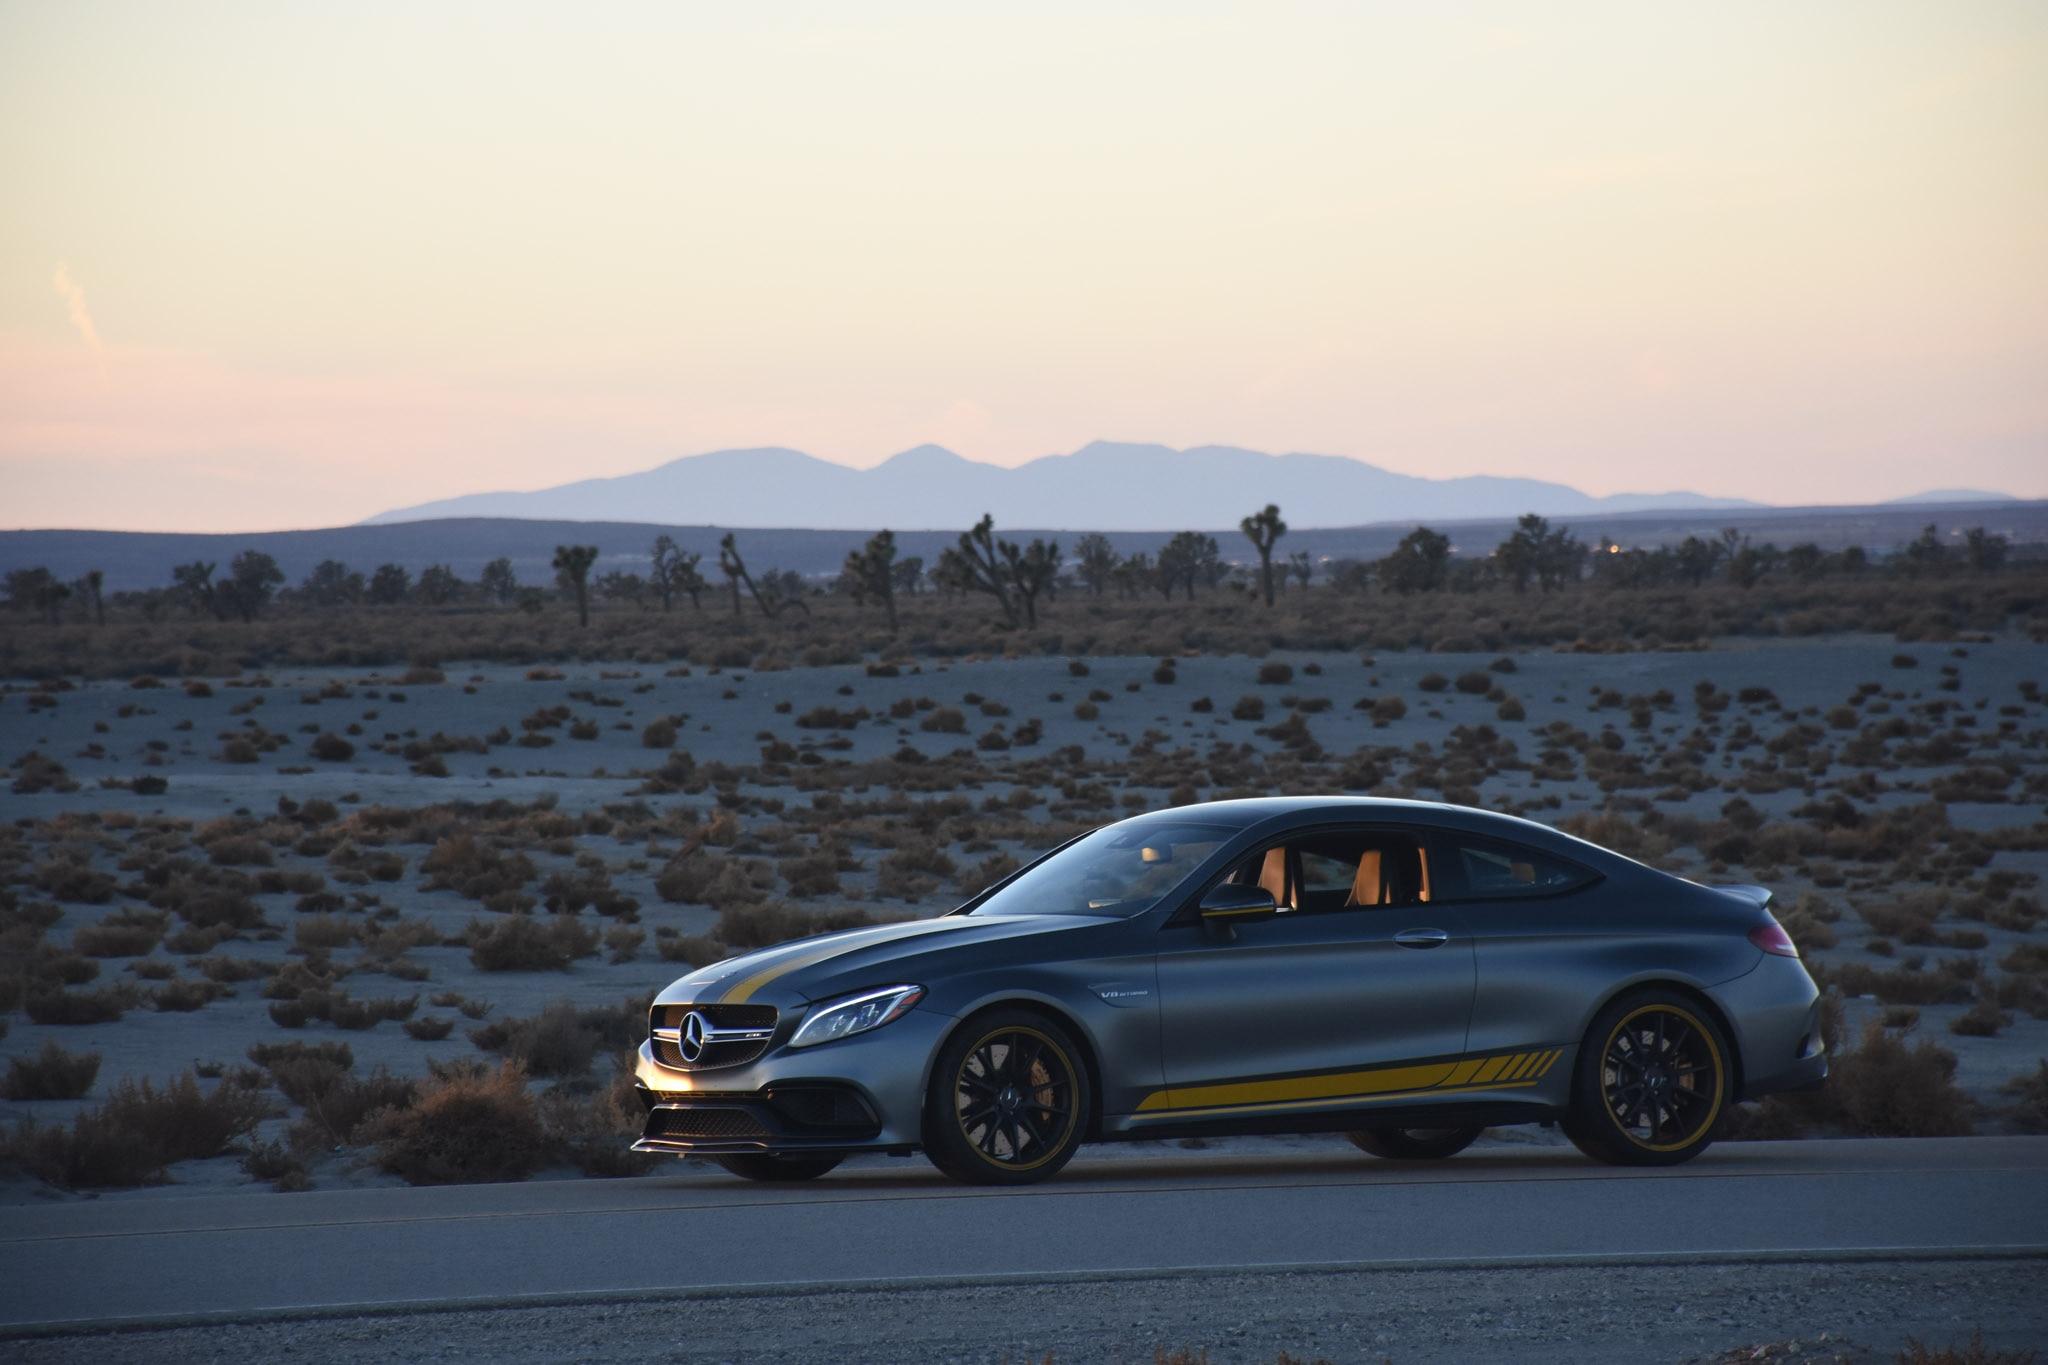 https://st.automobilemag.com/uploads/sites/11/2017/06/2017-Mercedes-AMG-C63-S-Coupe-40.jpg